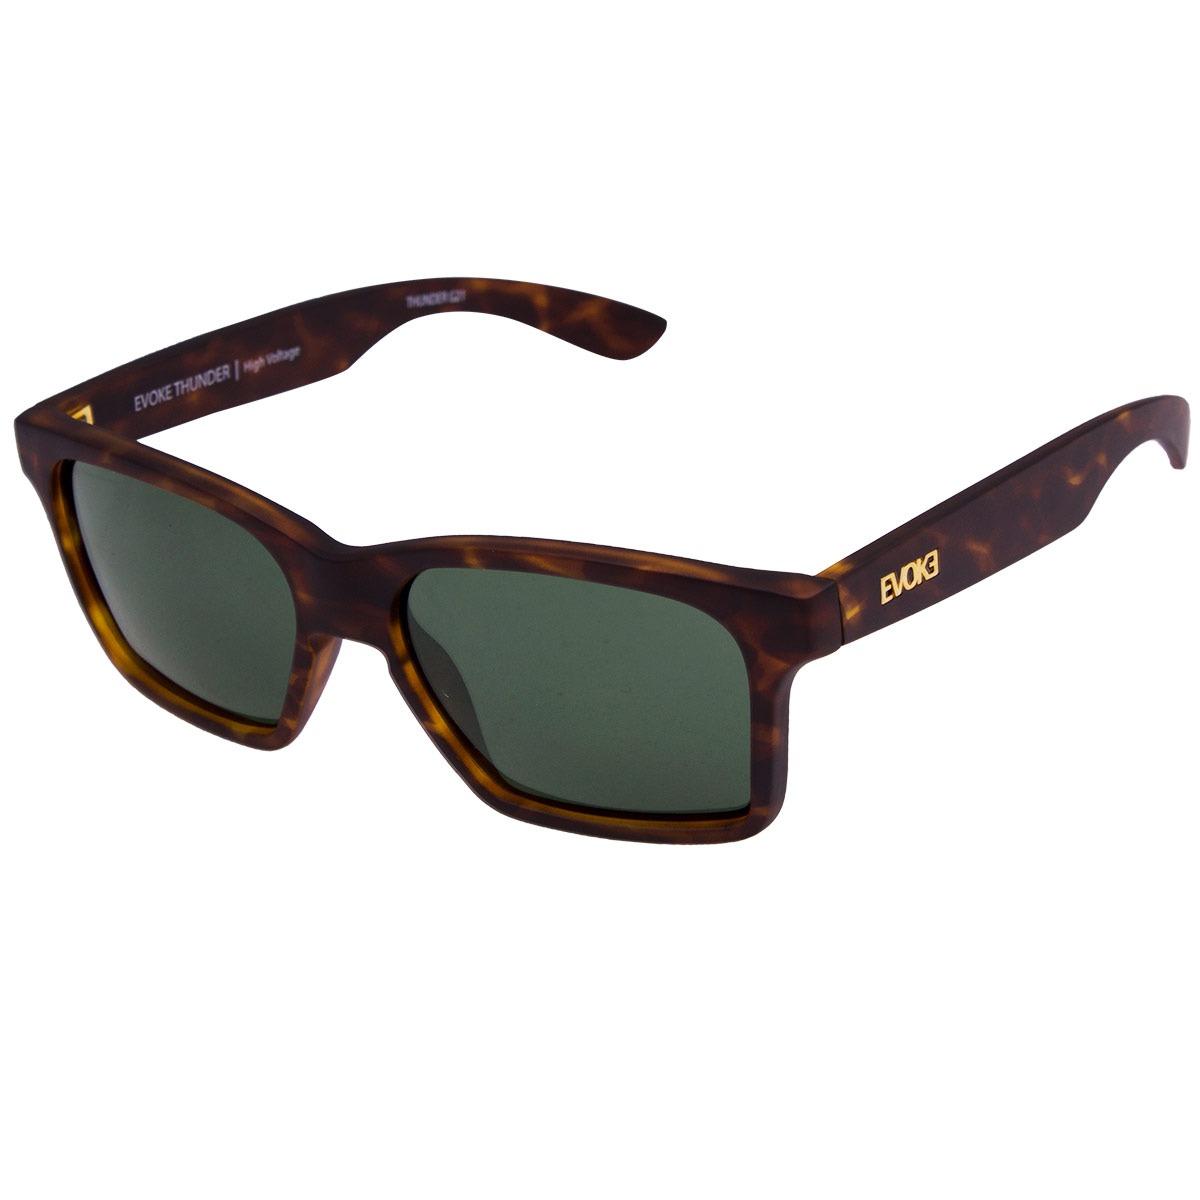 1c92205d8afcc Óculos De Sol Evoke Thunder - Turtle gold green - R  474,00 em ...